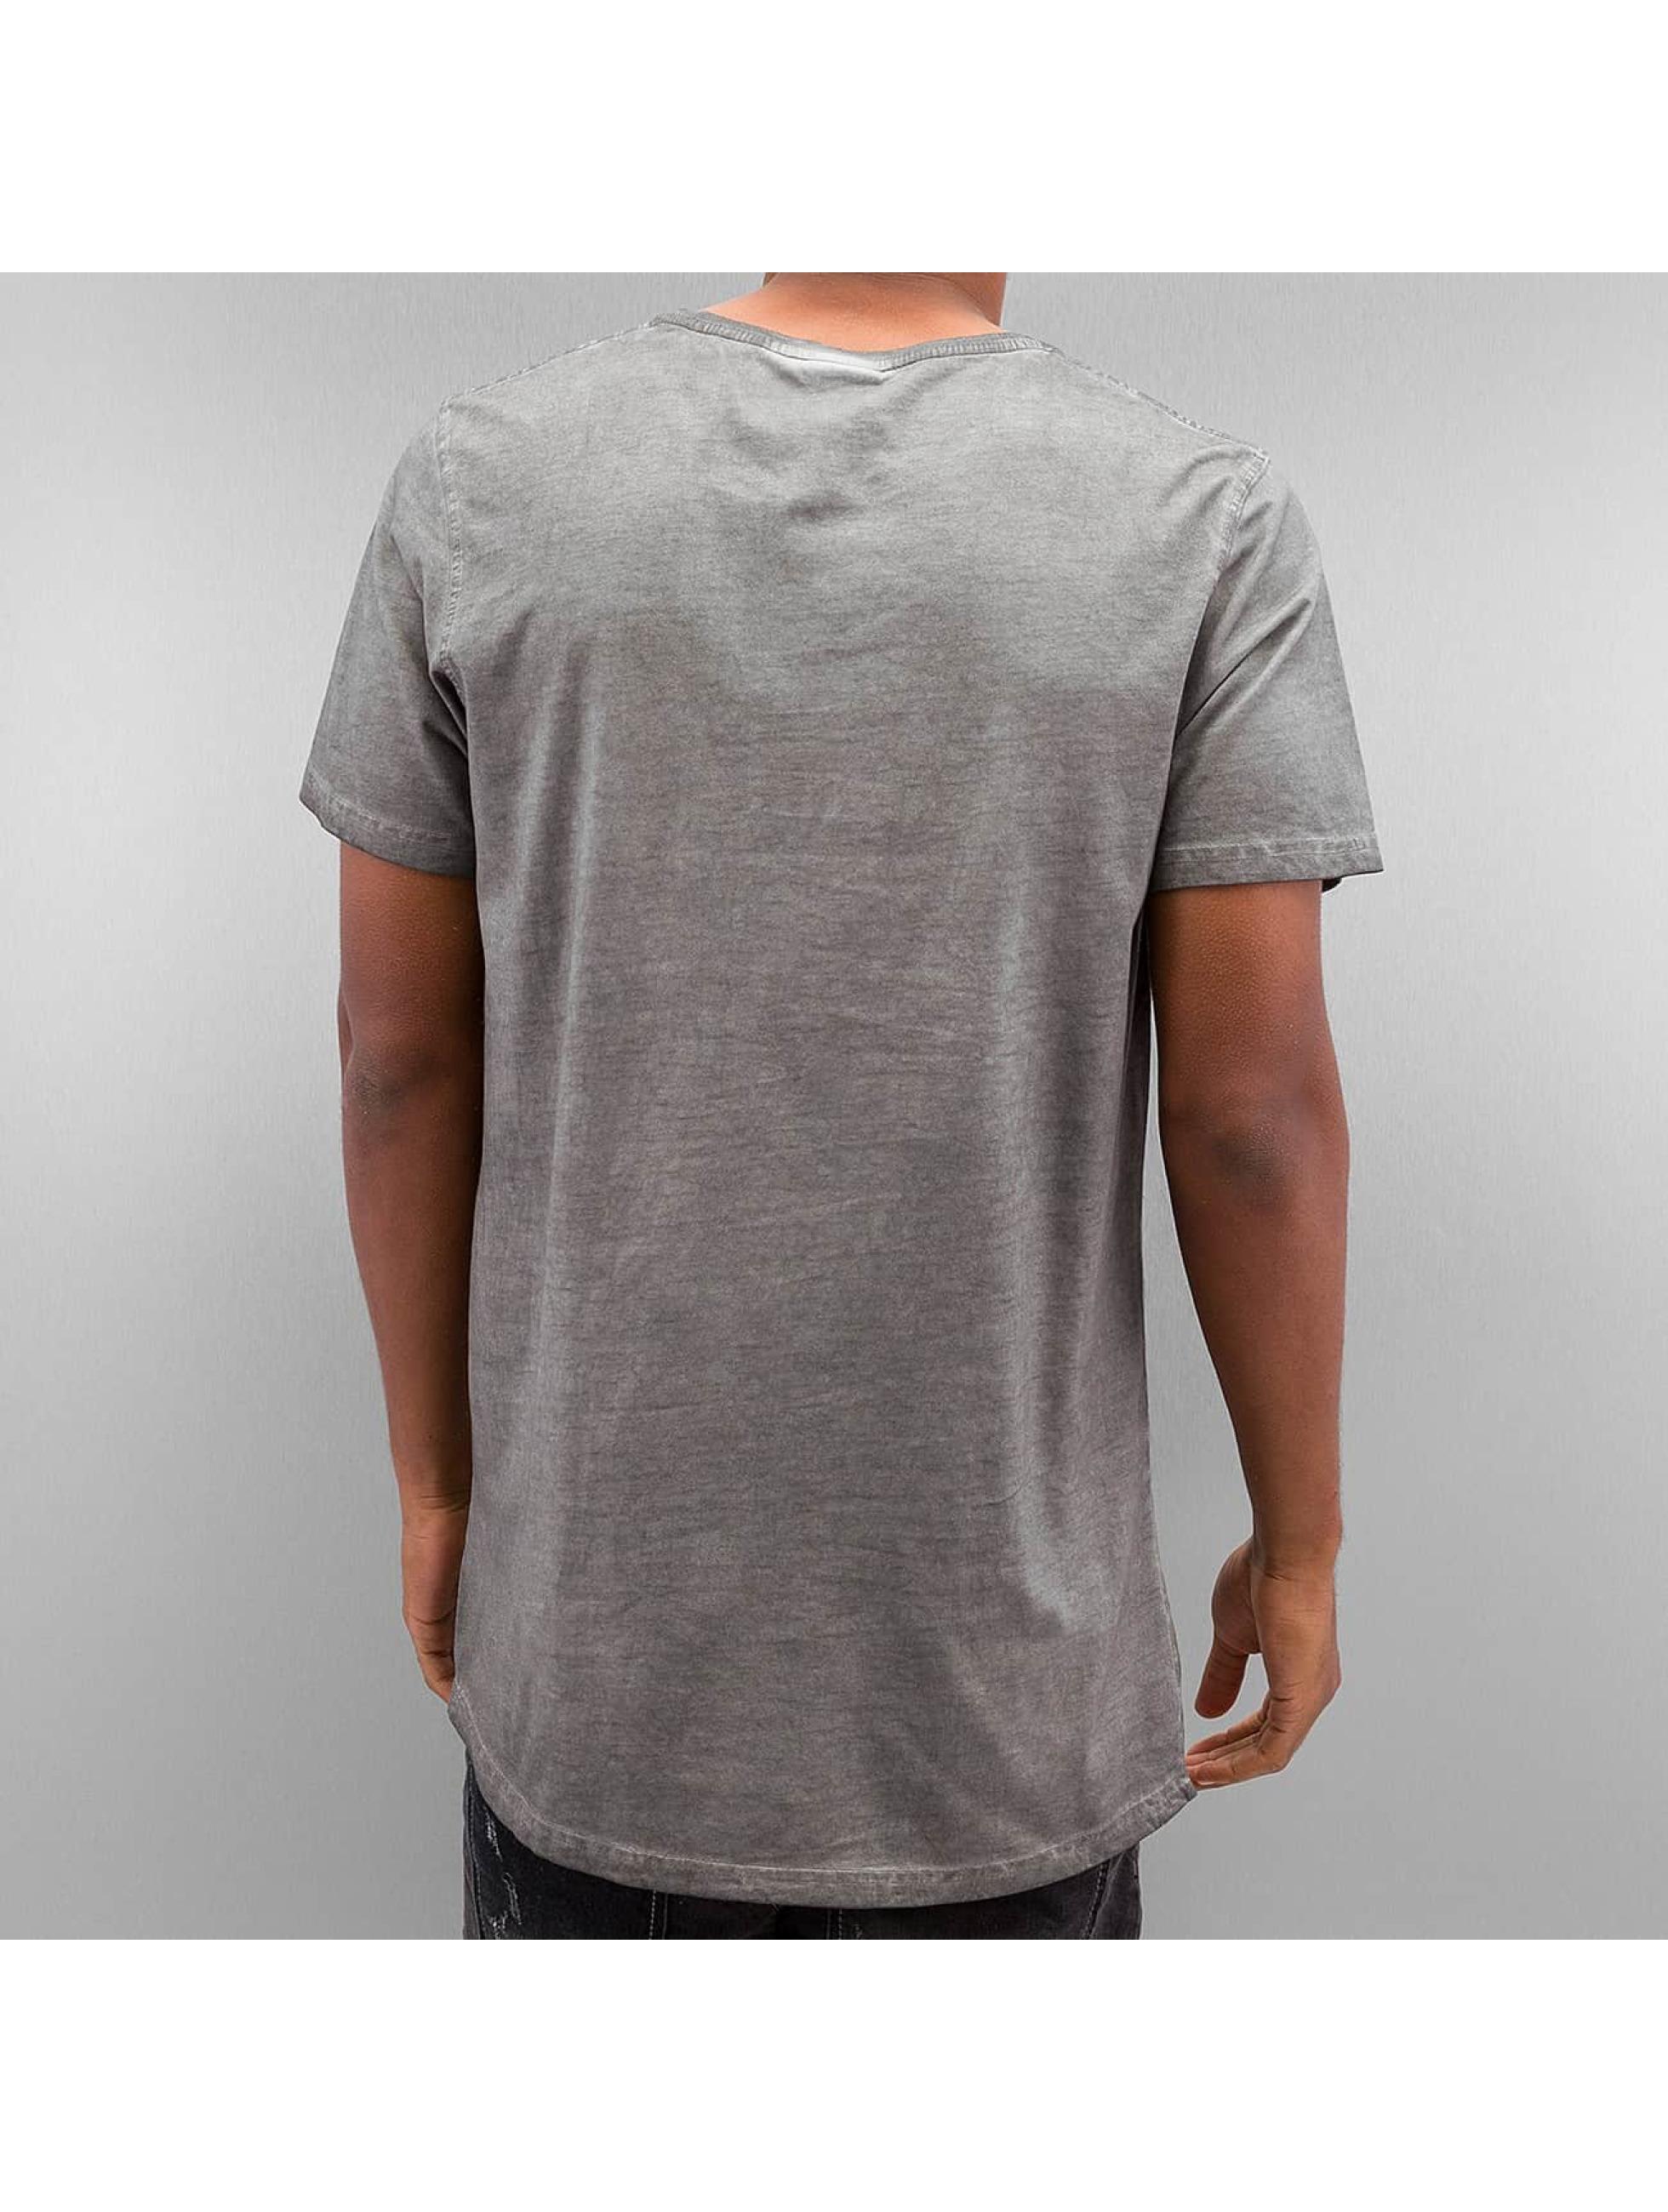 Urban Classics T-Shirt Shaped Long Cold Dye gris